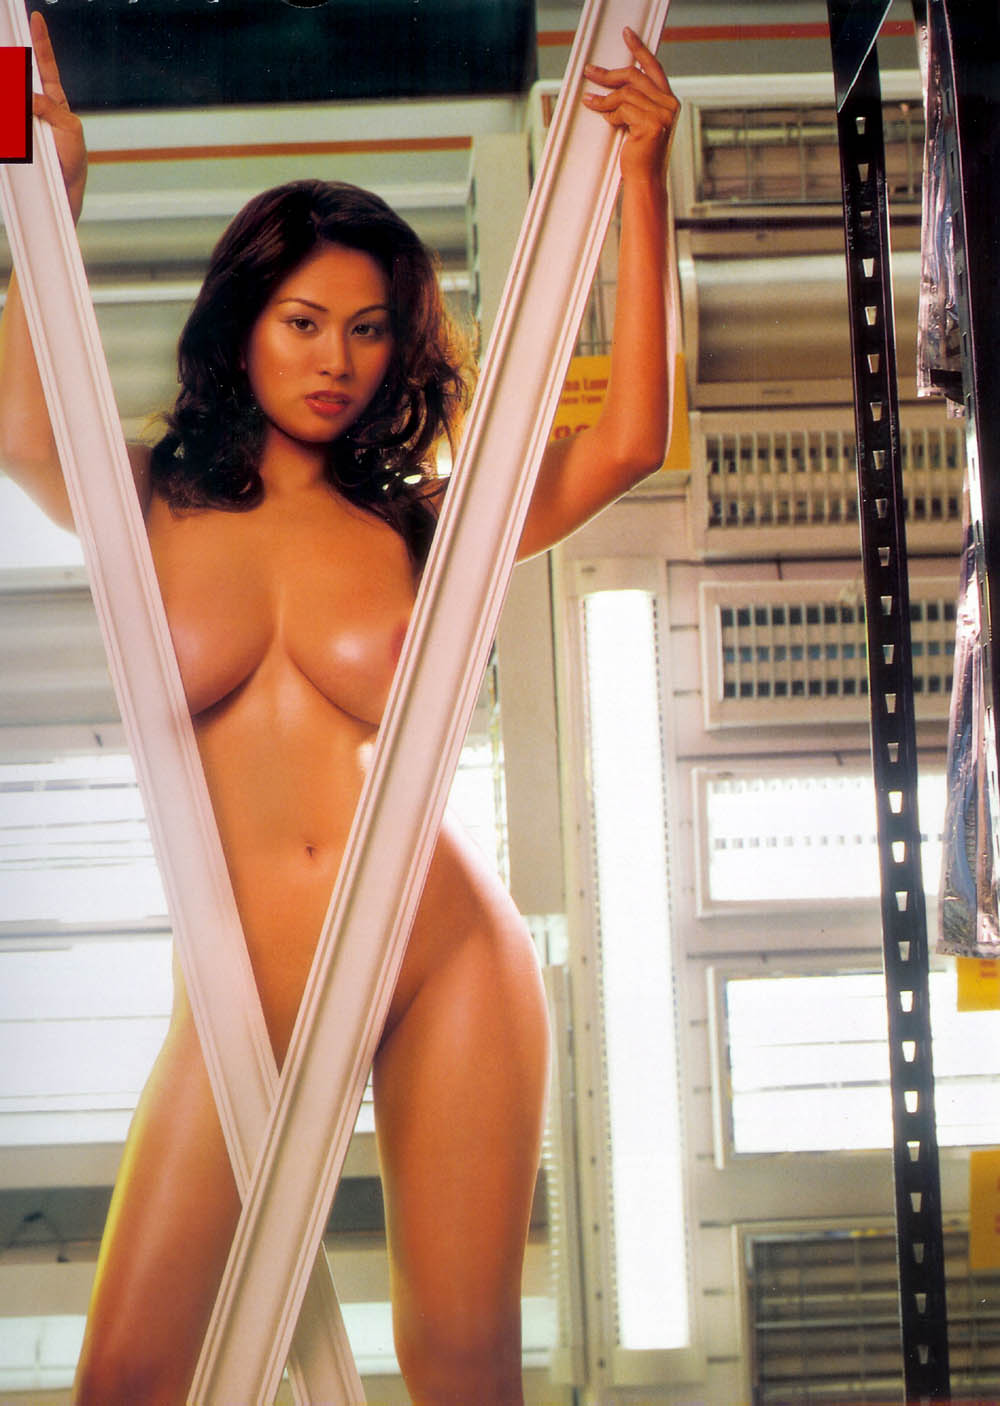 Opinion, Myles hernandez nude are